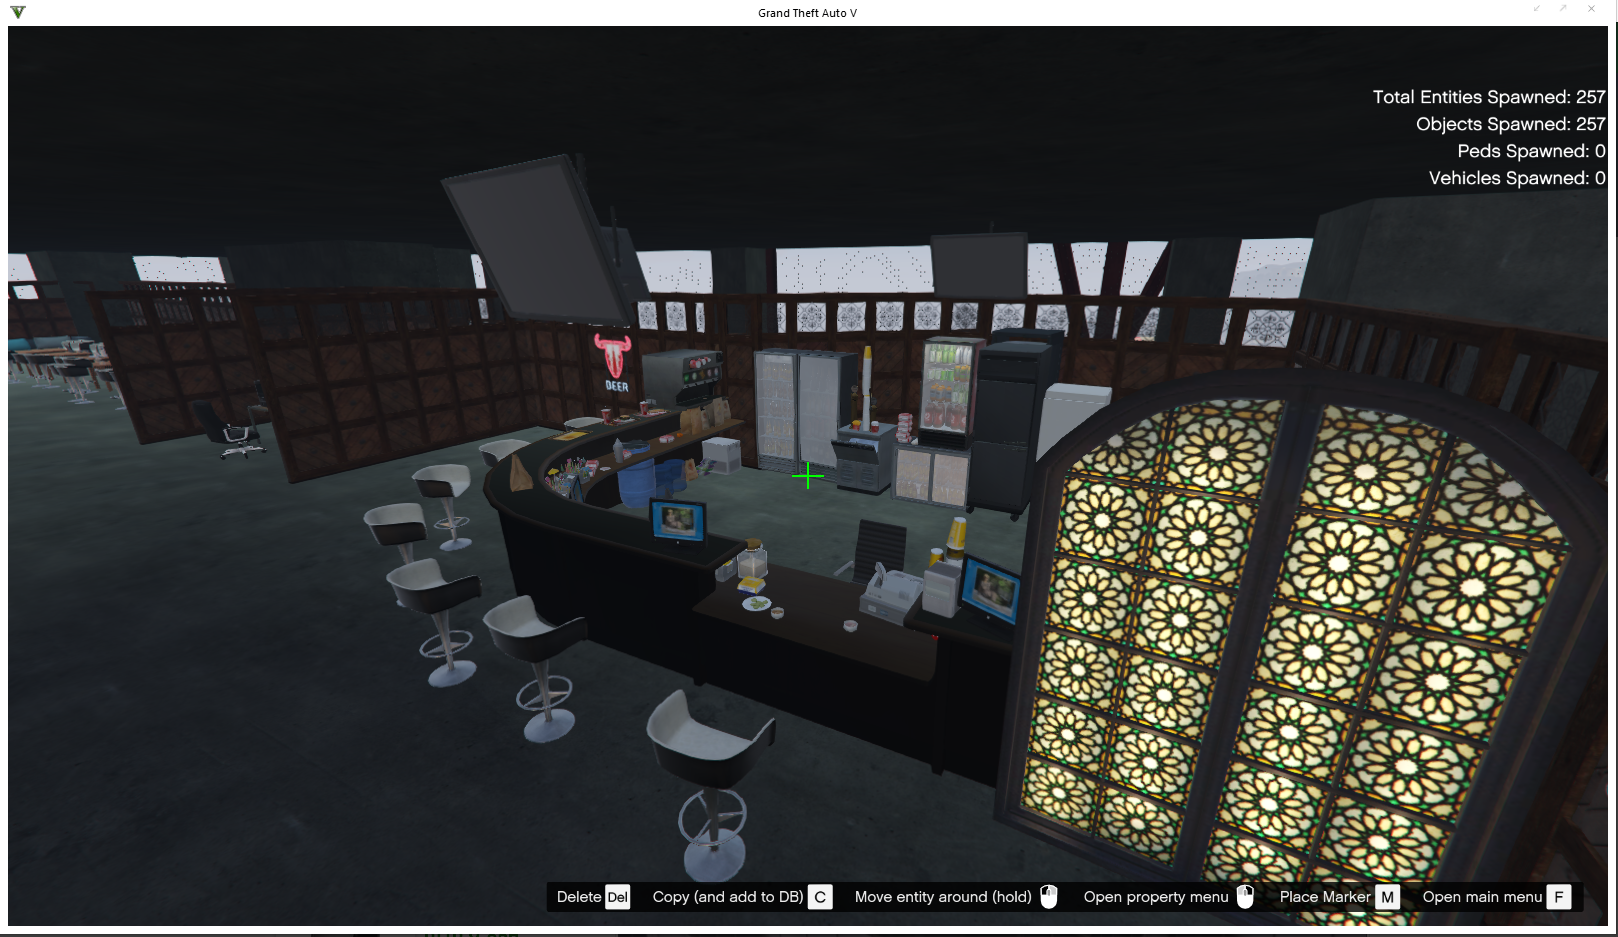 Construction NightClub (Menyoo) - GTA5-Mods com